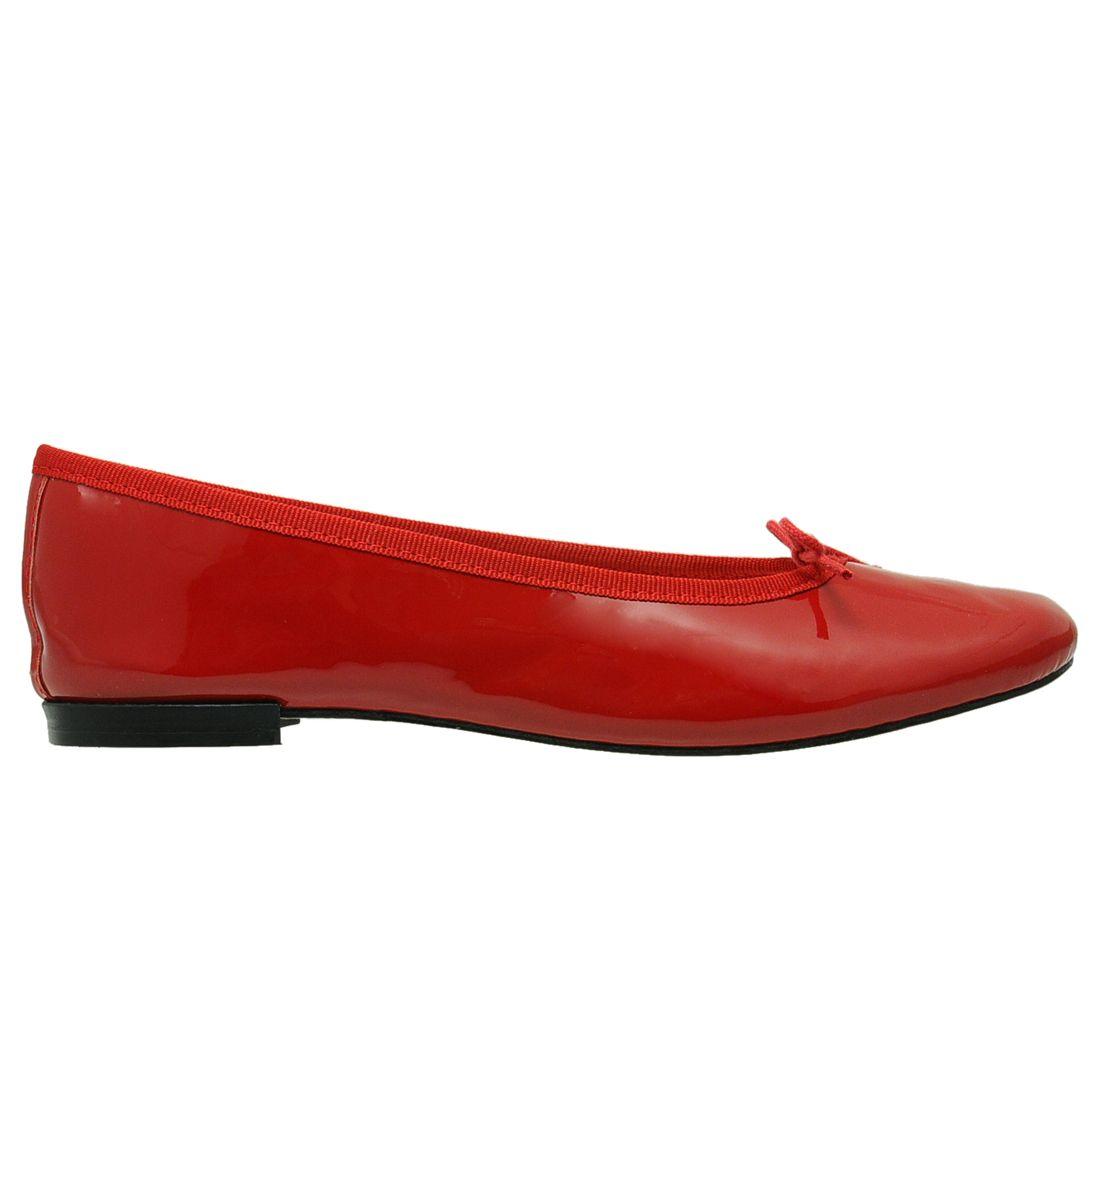 Ballerines en cuir verni Rouge Galeries LafayetteGaleries Lafayette ysx2e